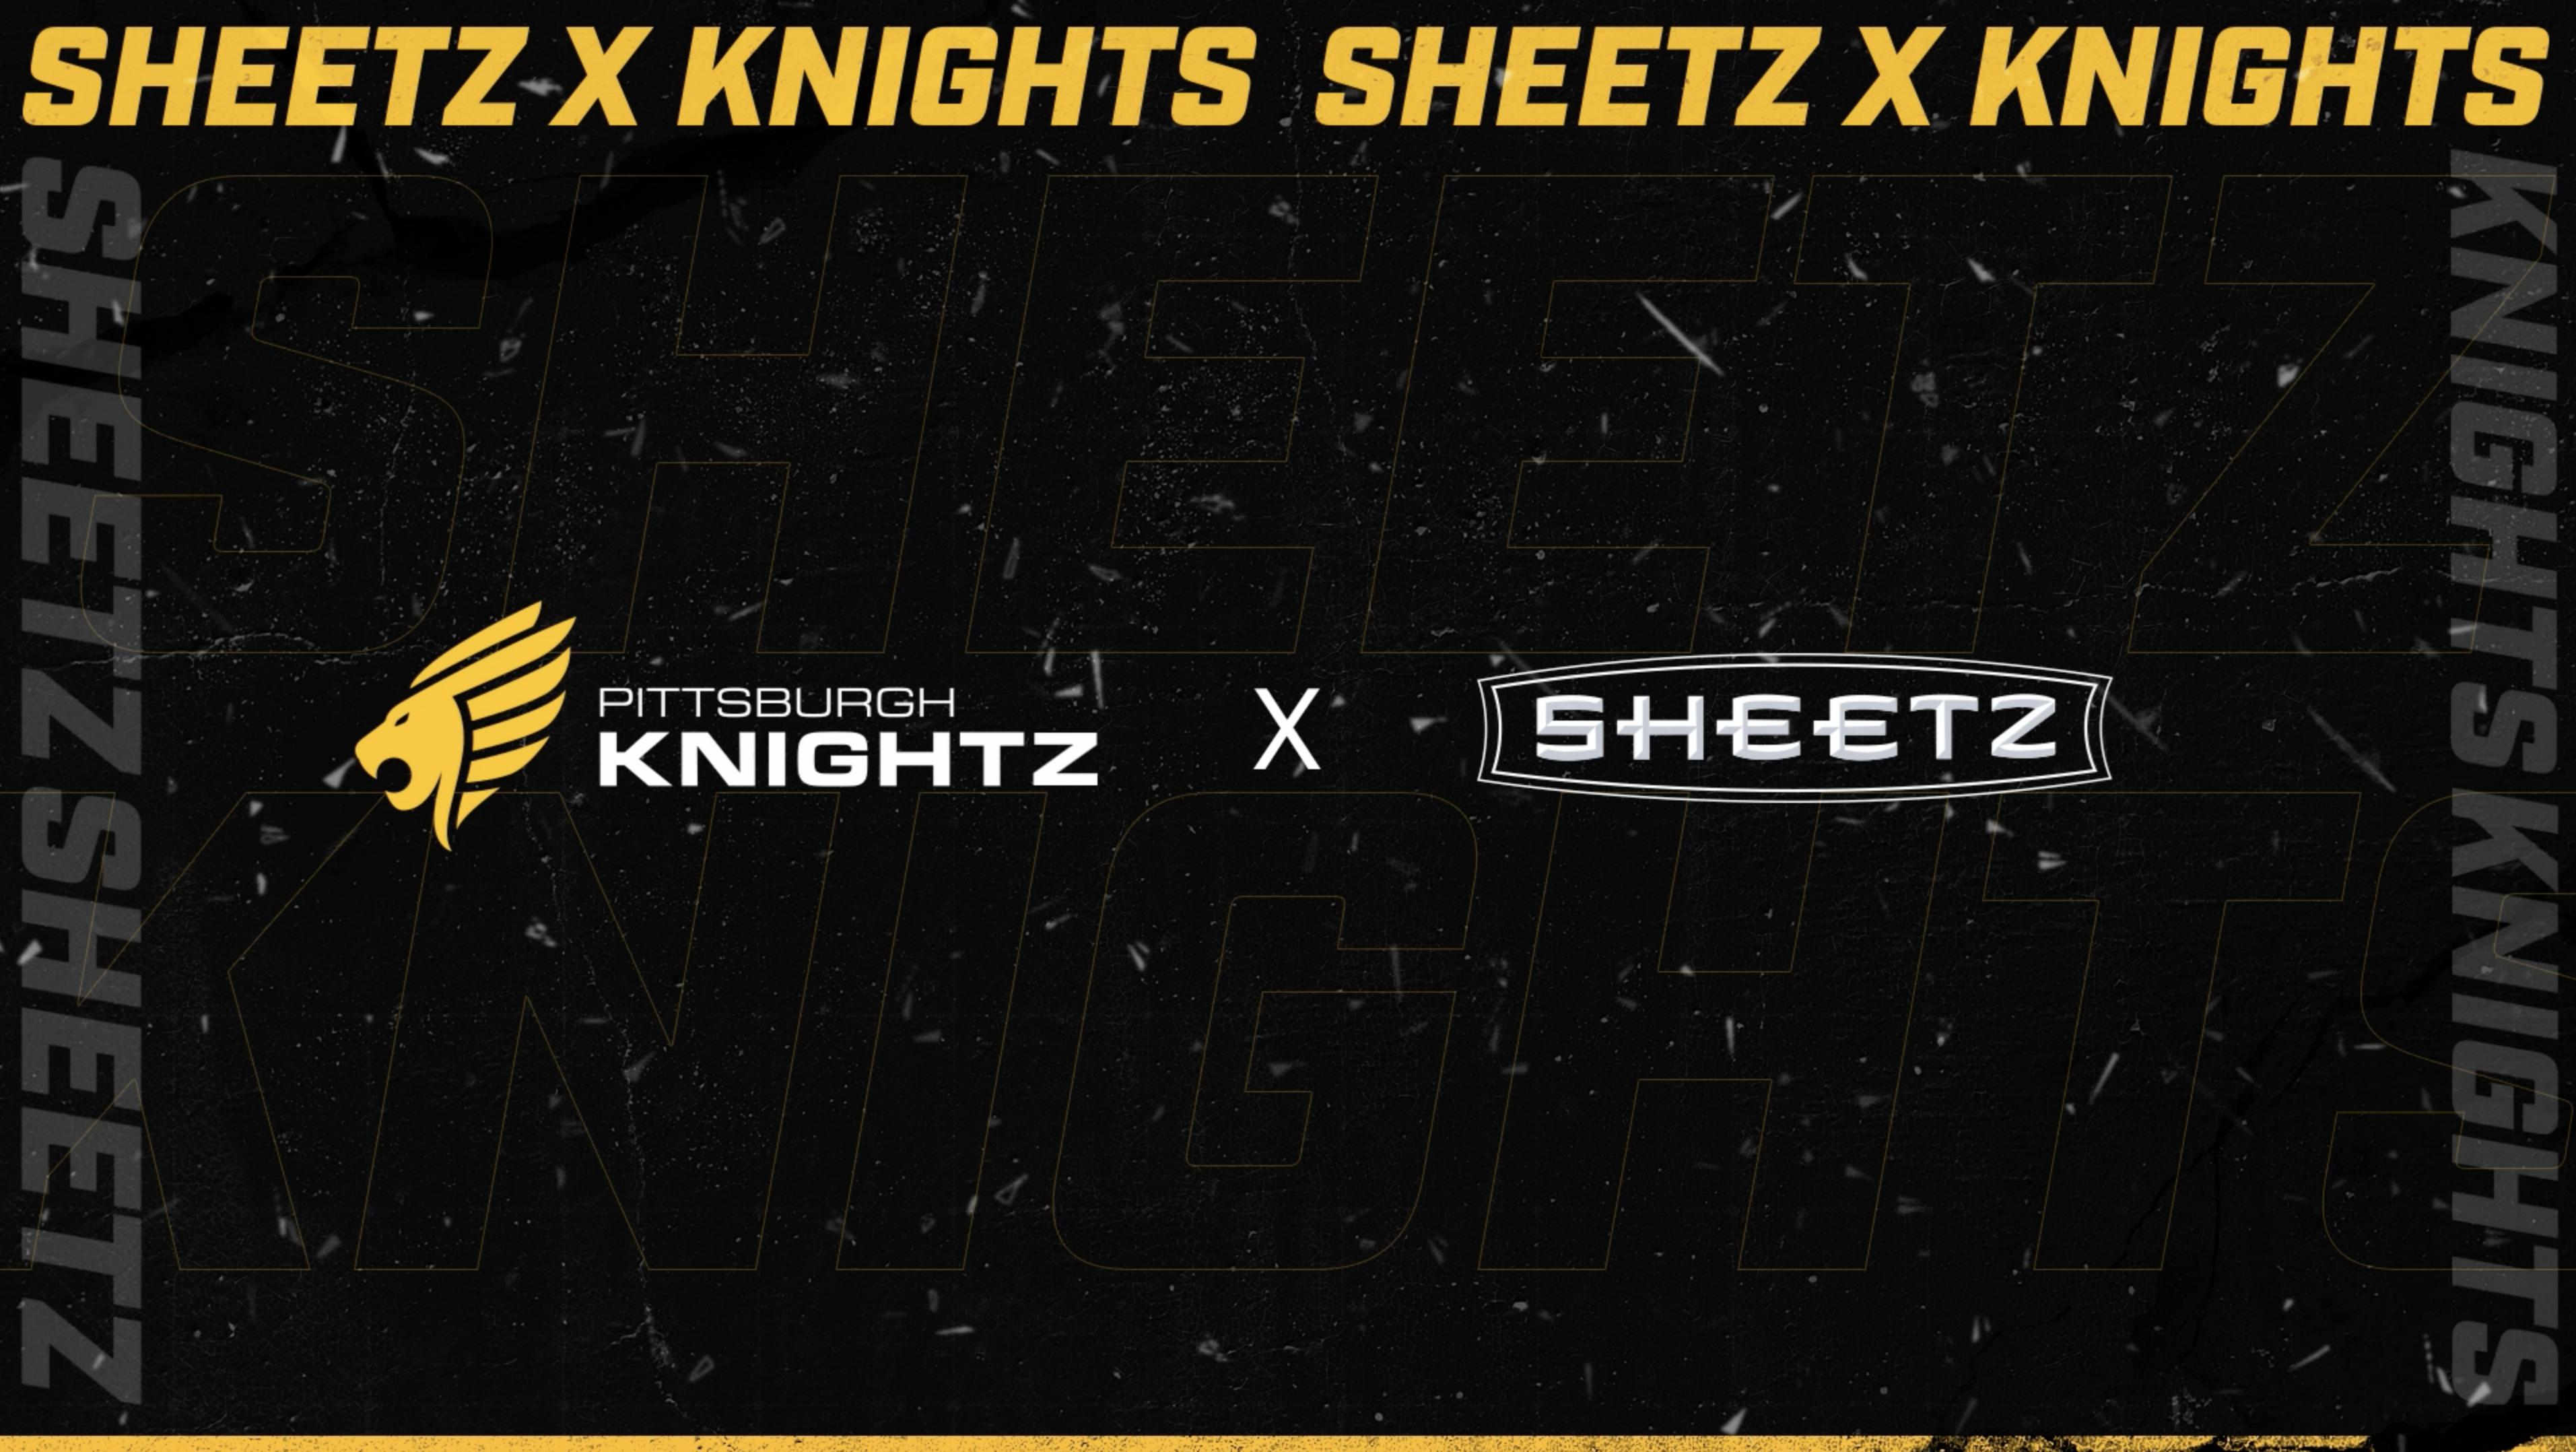 Pittsburgh Knights Sheetz